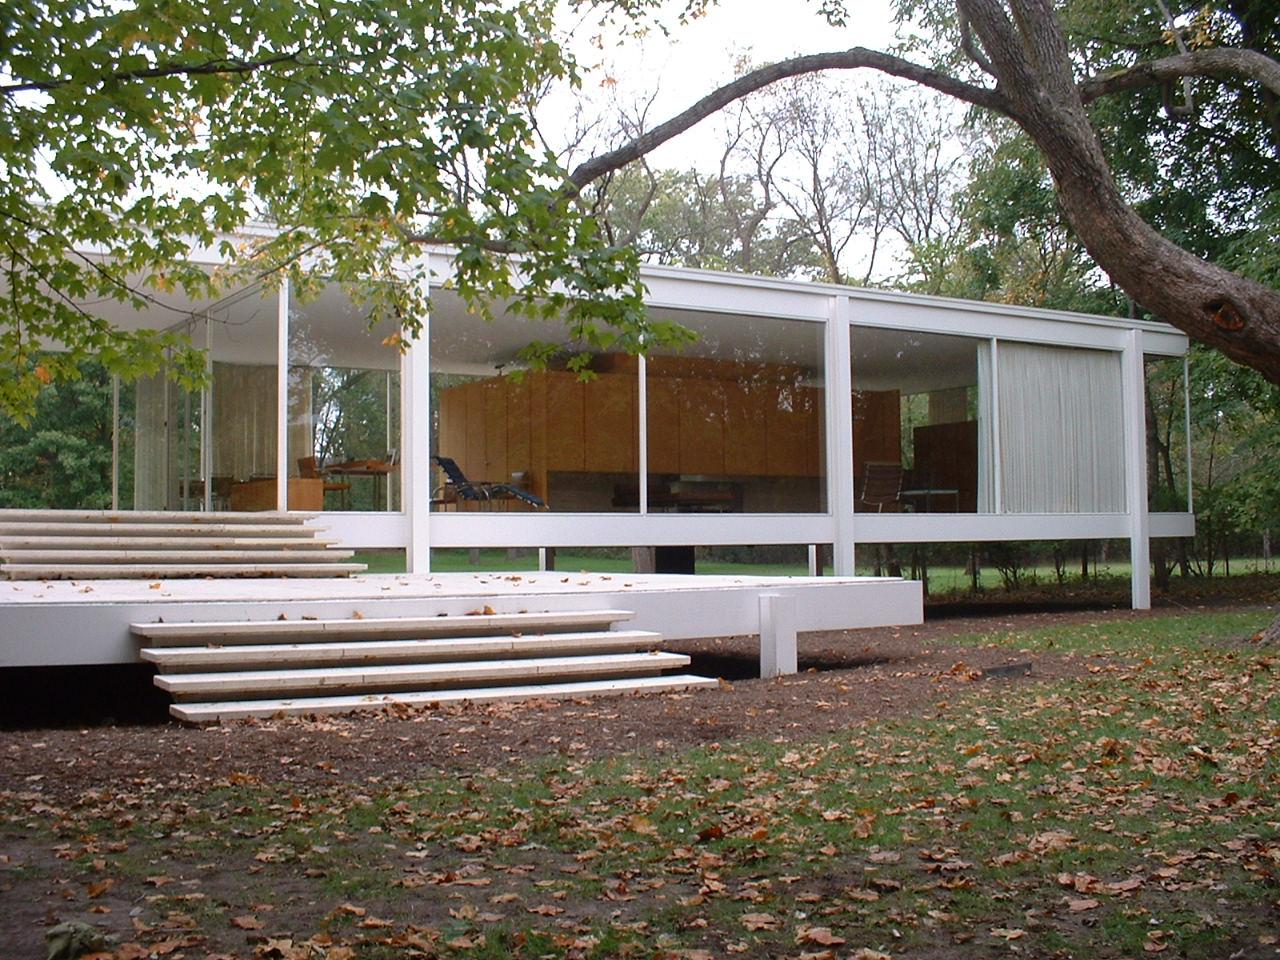 Farnsworth House By Mies Van Der Rohe Historic Design